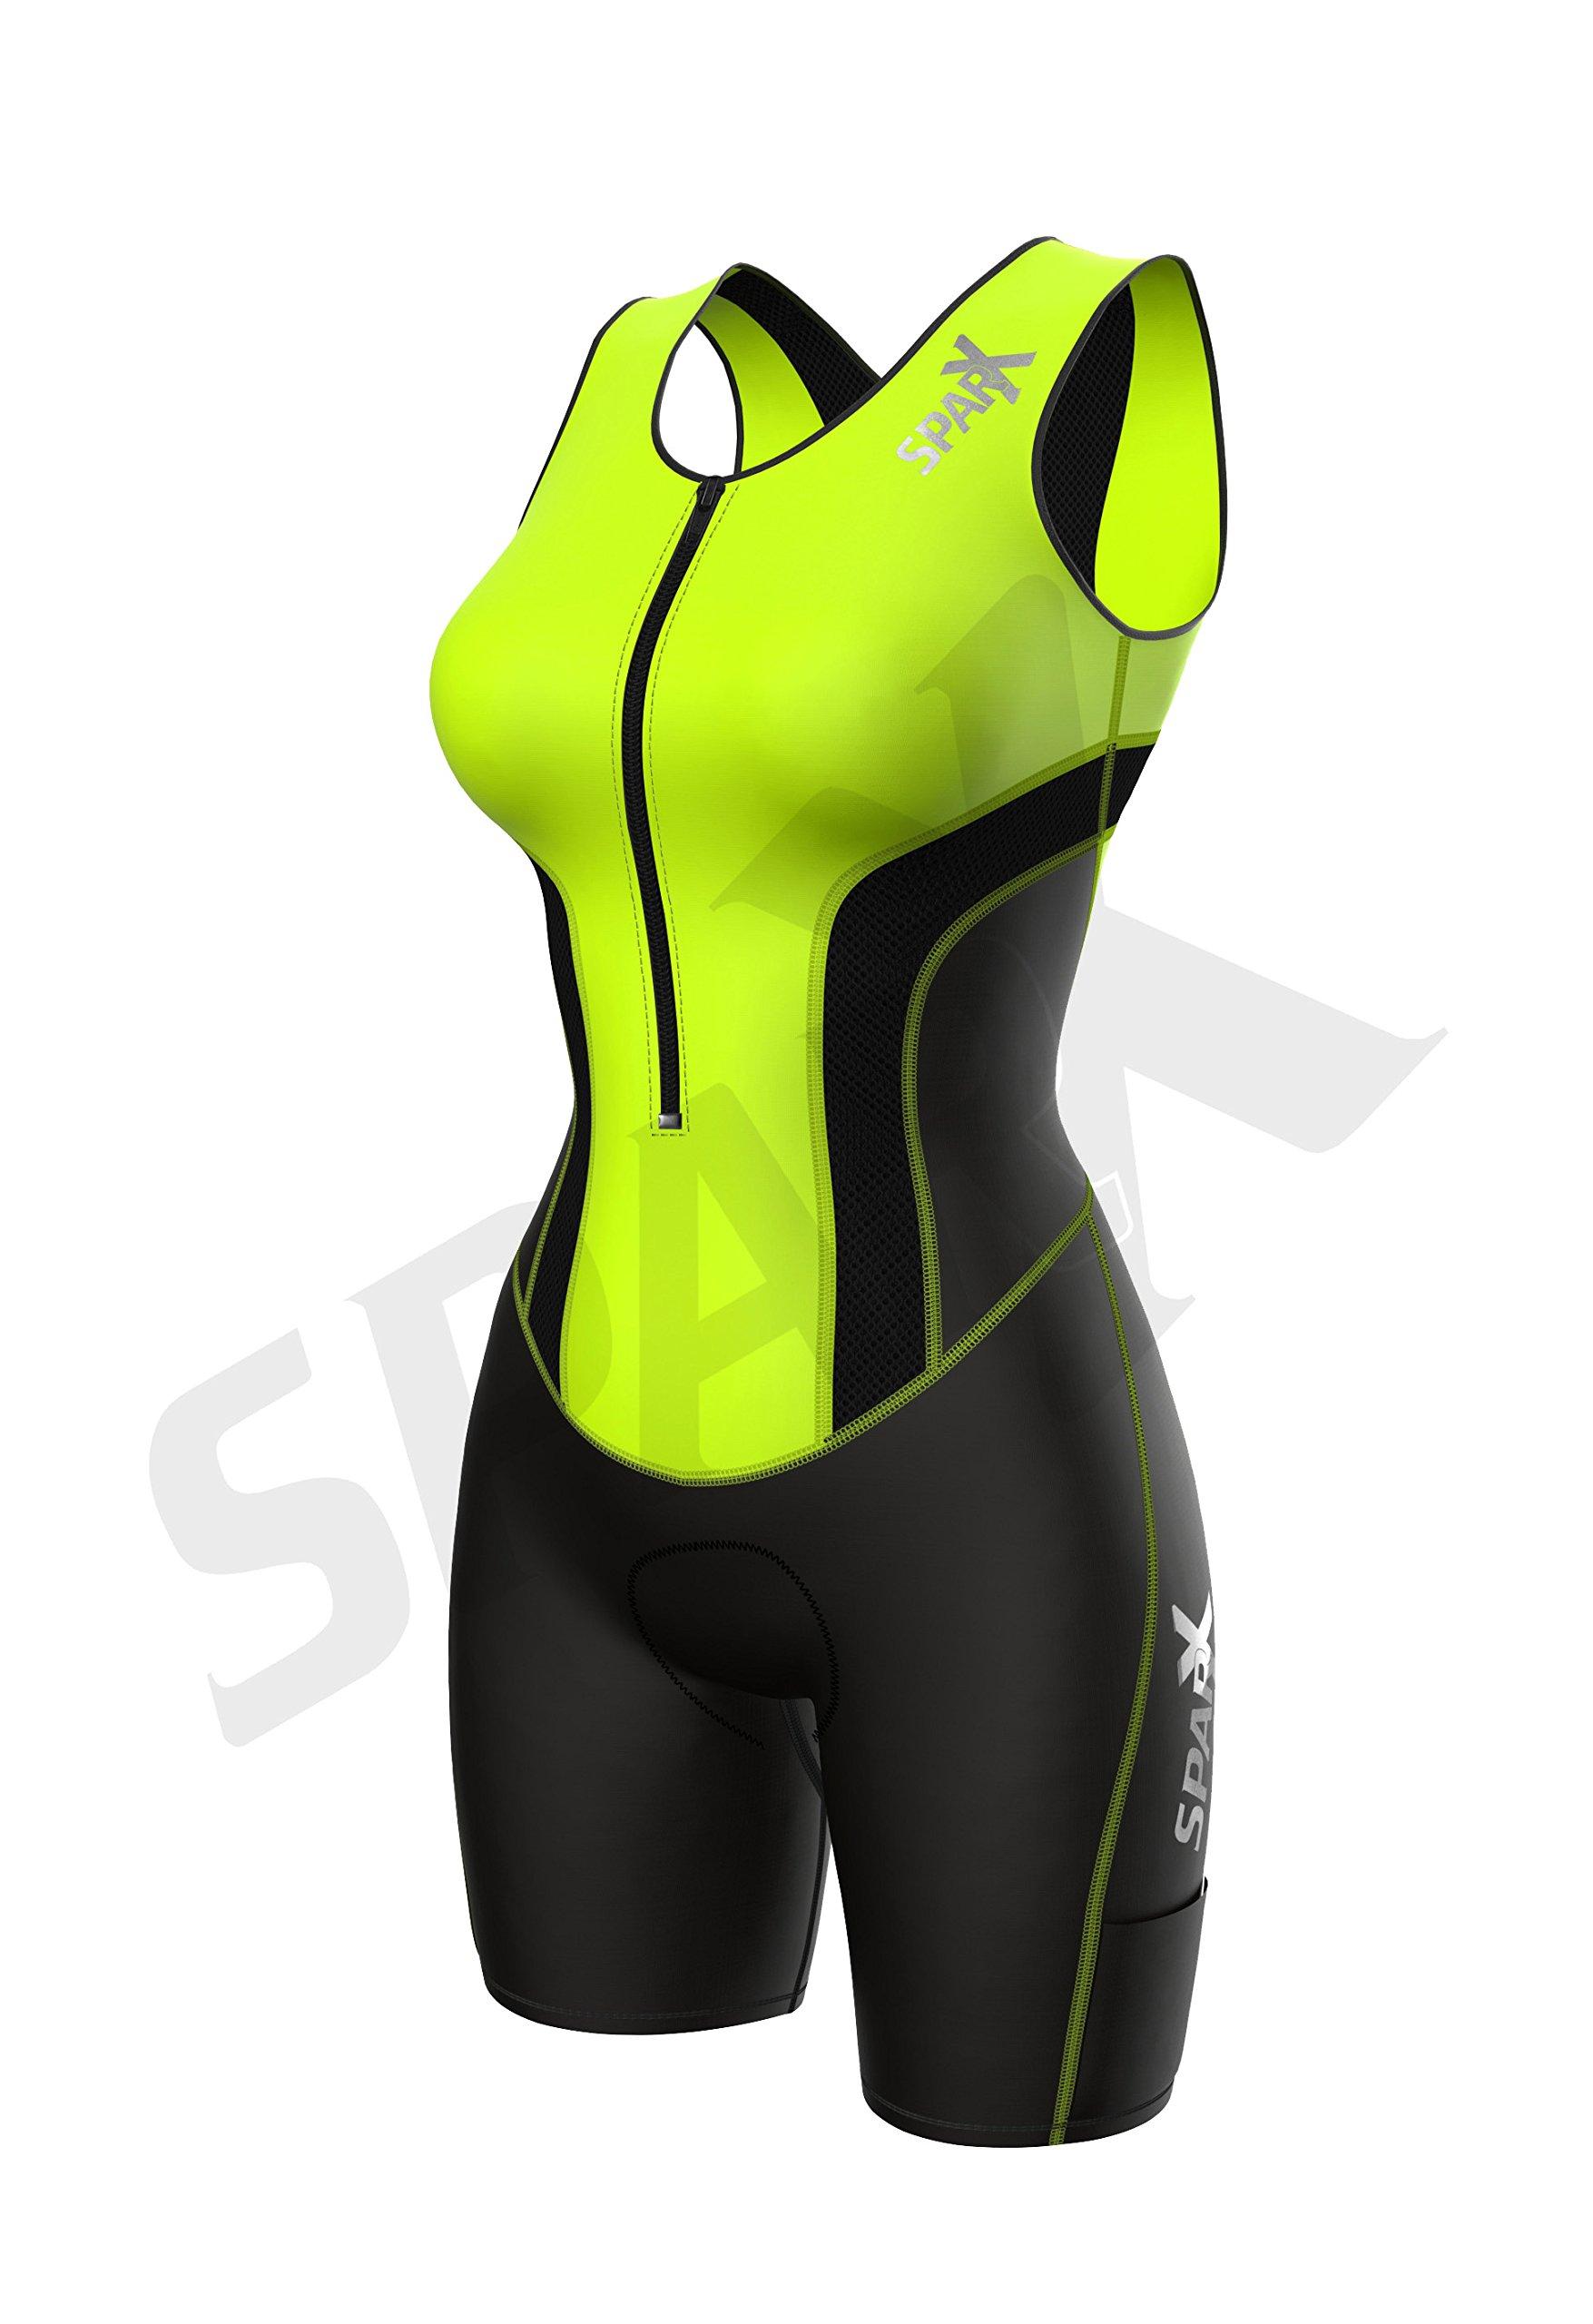 Sparx Women Triathlon Suit Tri Short Racing Cycling Swim Run (Small, Neon Green) by Sparx Sports (Image #3)